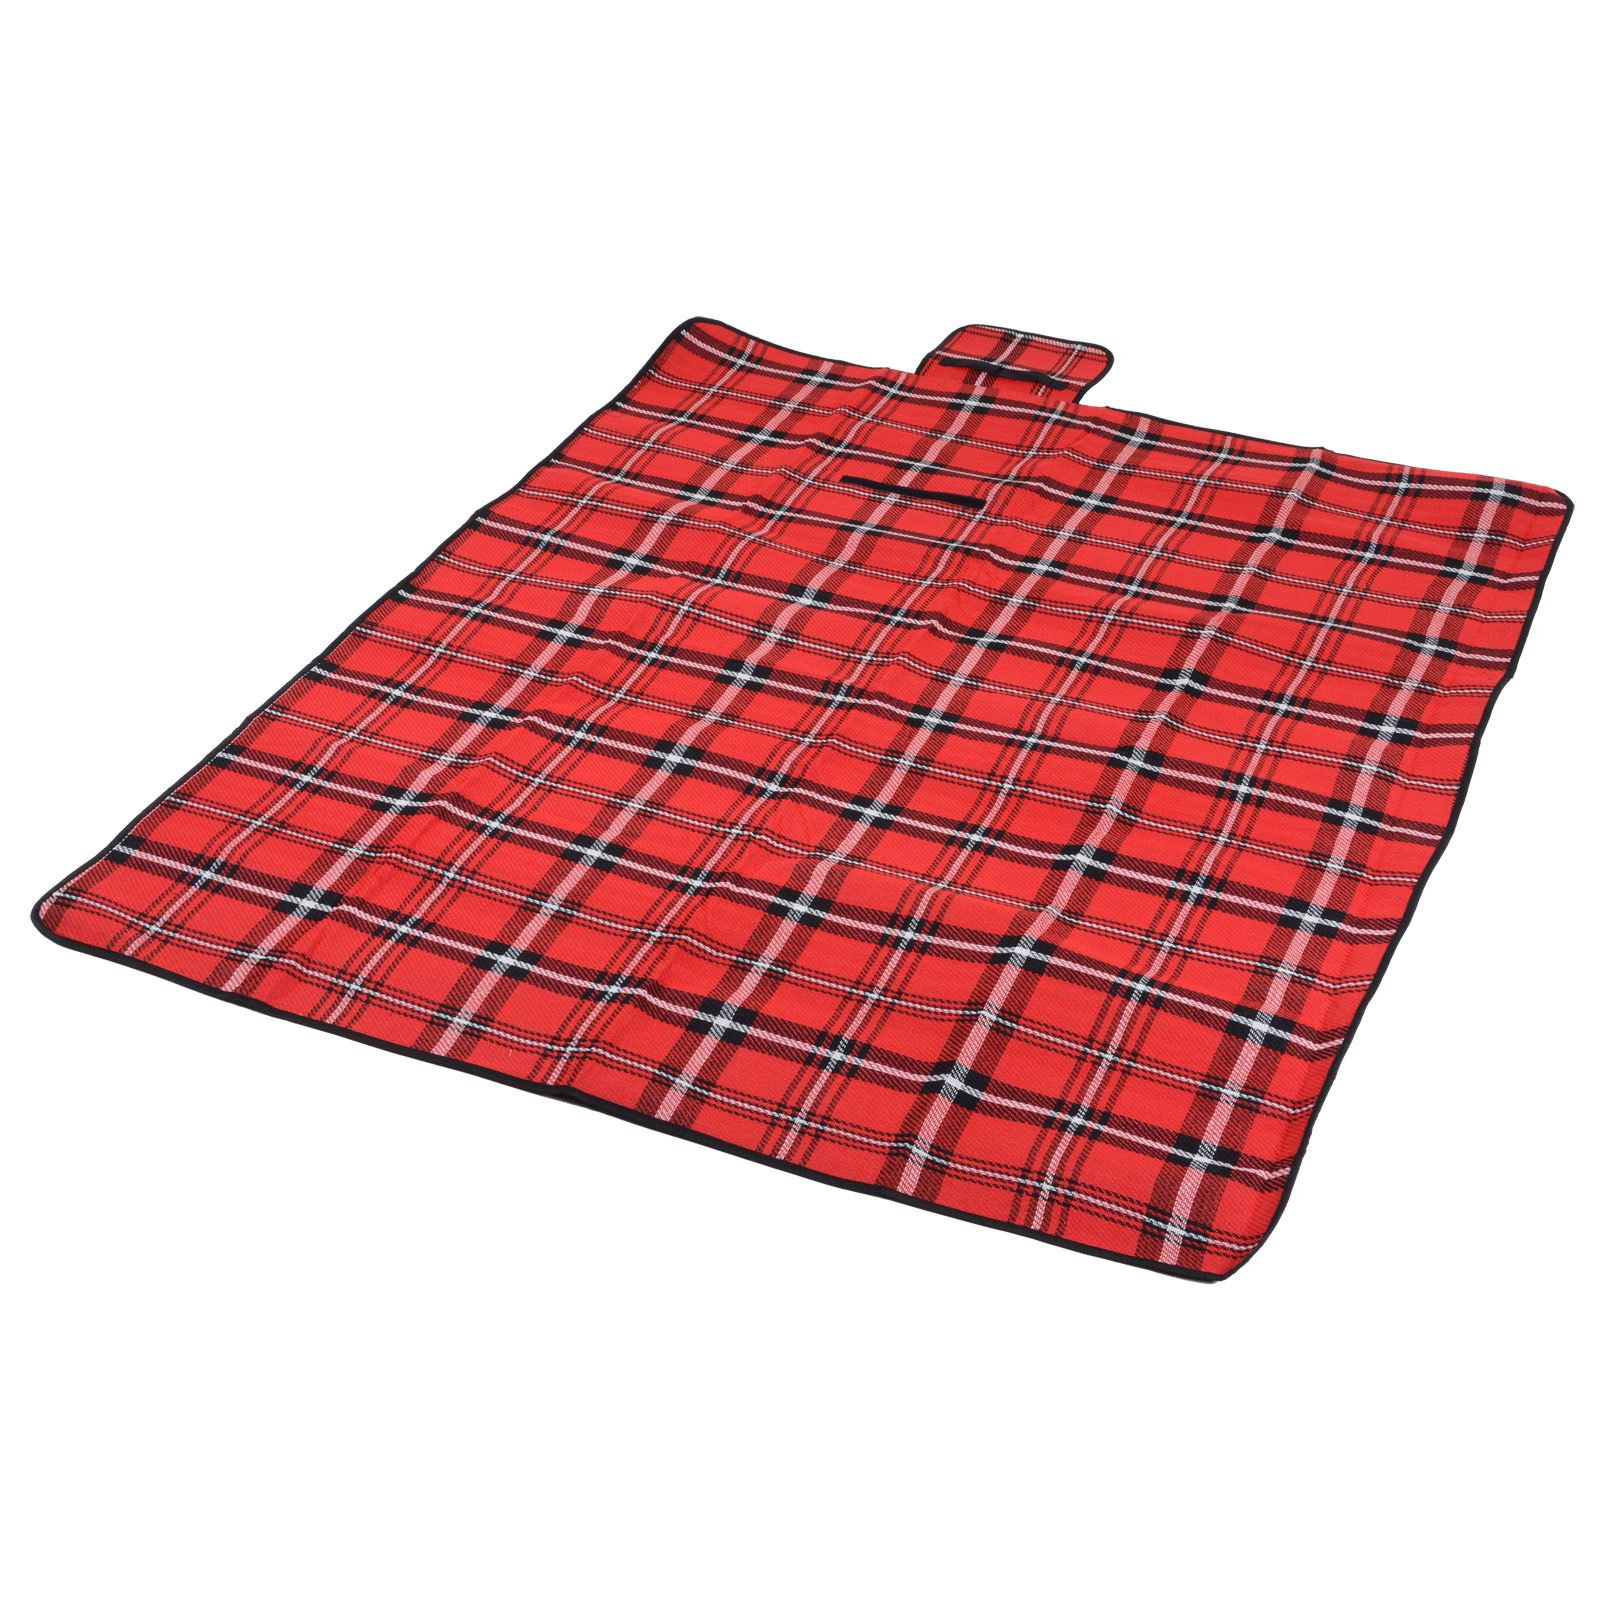 Azuma Outdoor Picnic Blanket Rug PEVA Waterproof Backing ...